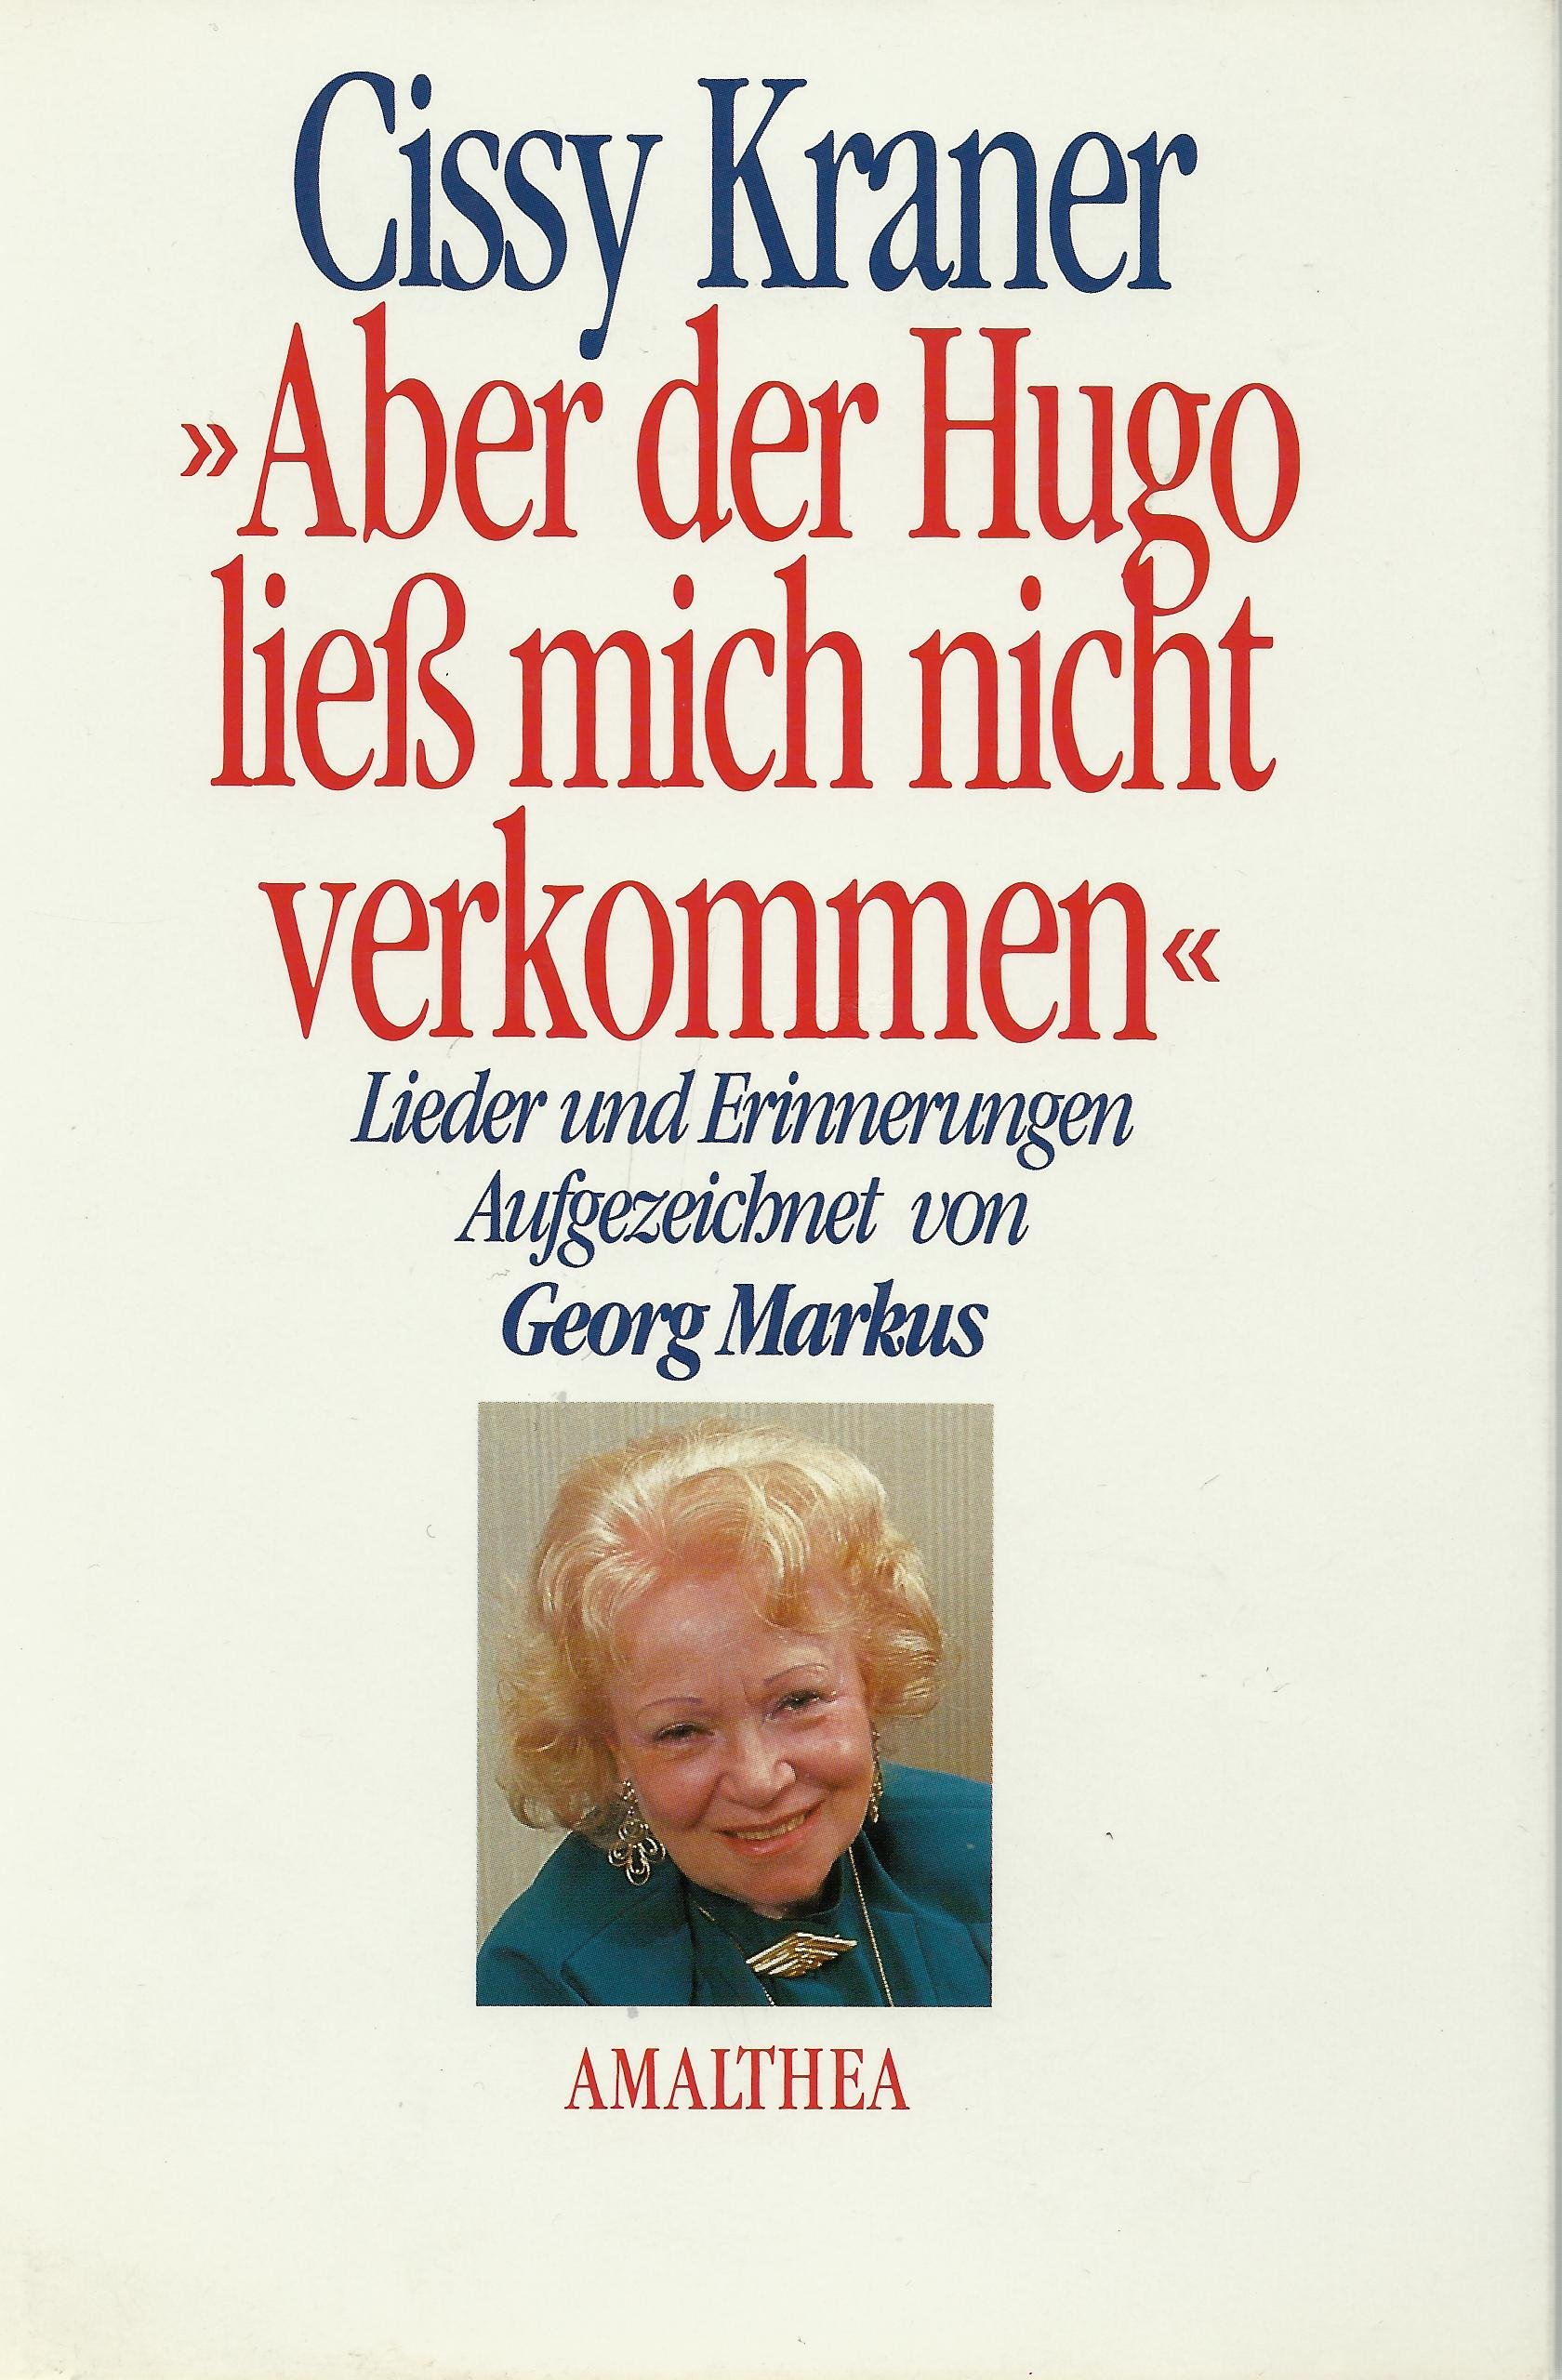 ' Aber der Hugo ließ mich nicht verkommen'. (Allemand) Relié – 31 août 1994 Cissy Kraner Amalthea Verlag 3850023591 Belletristik